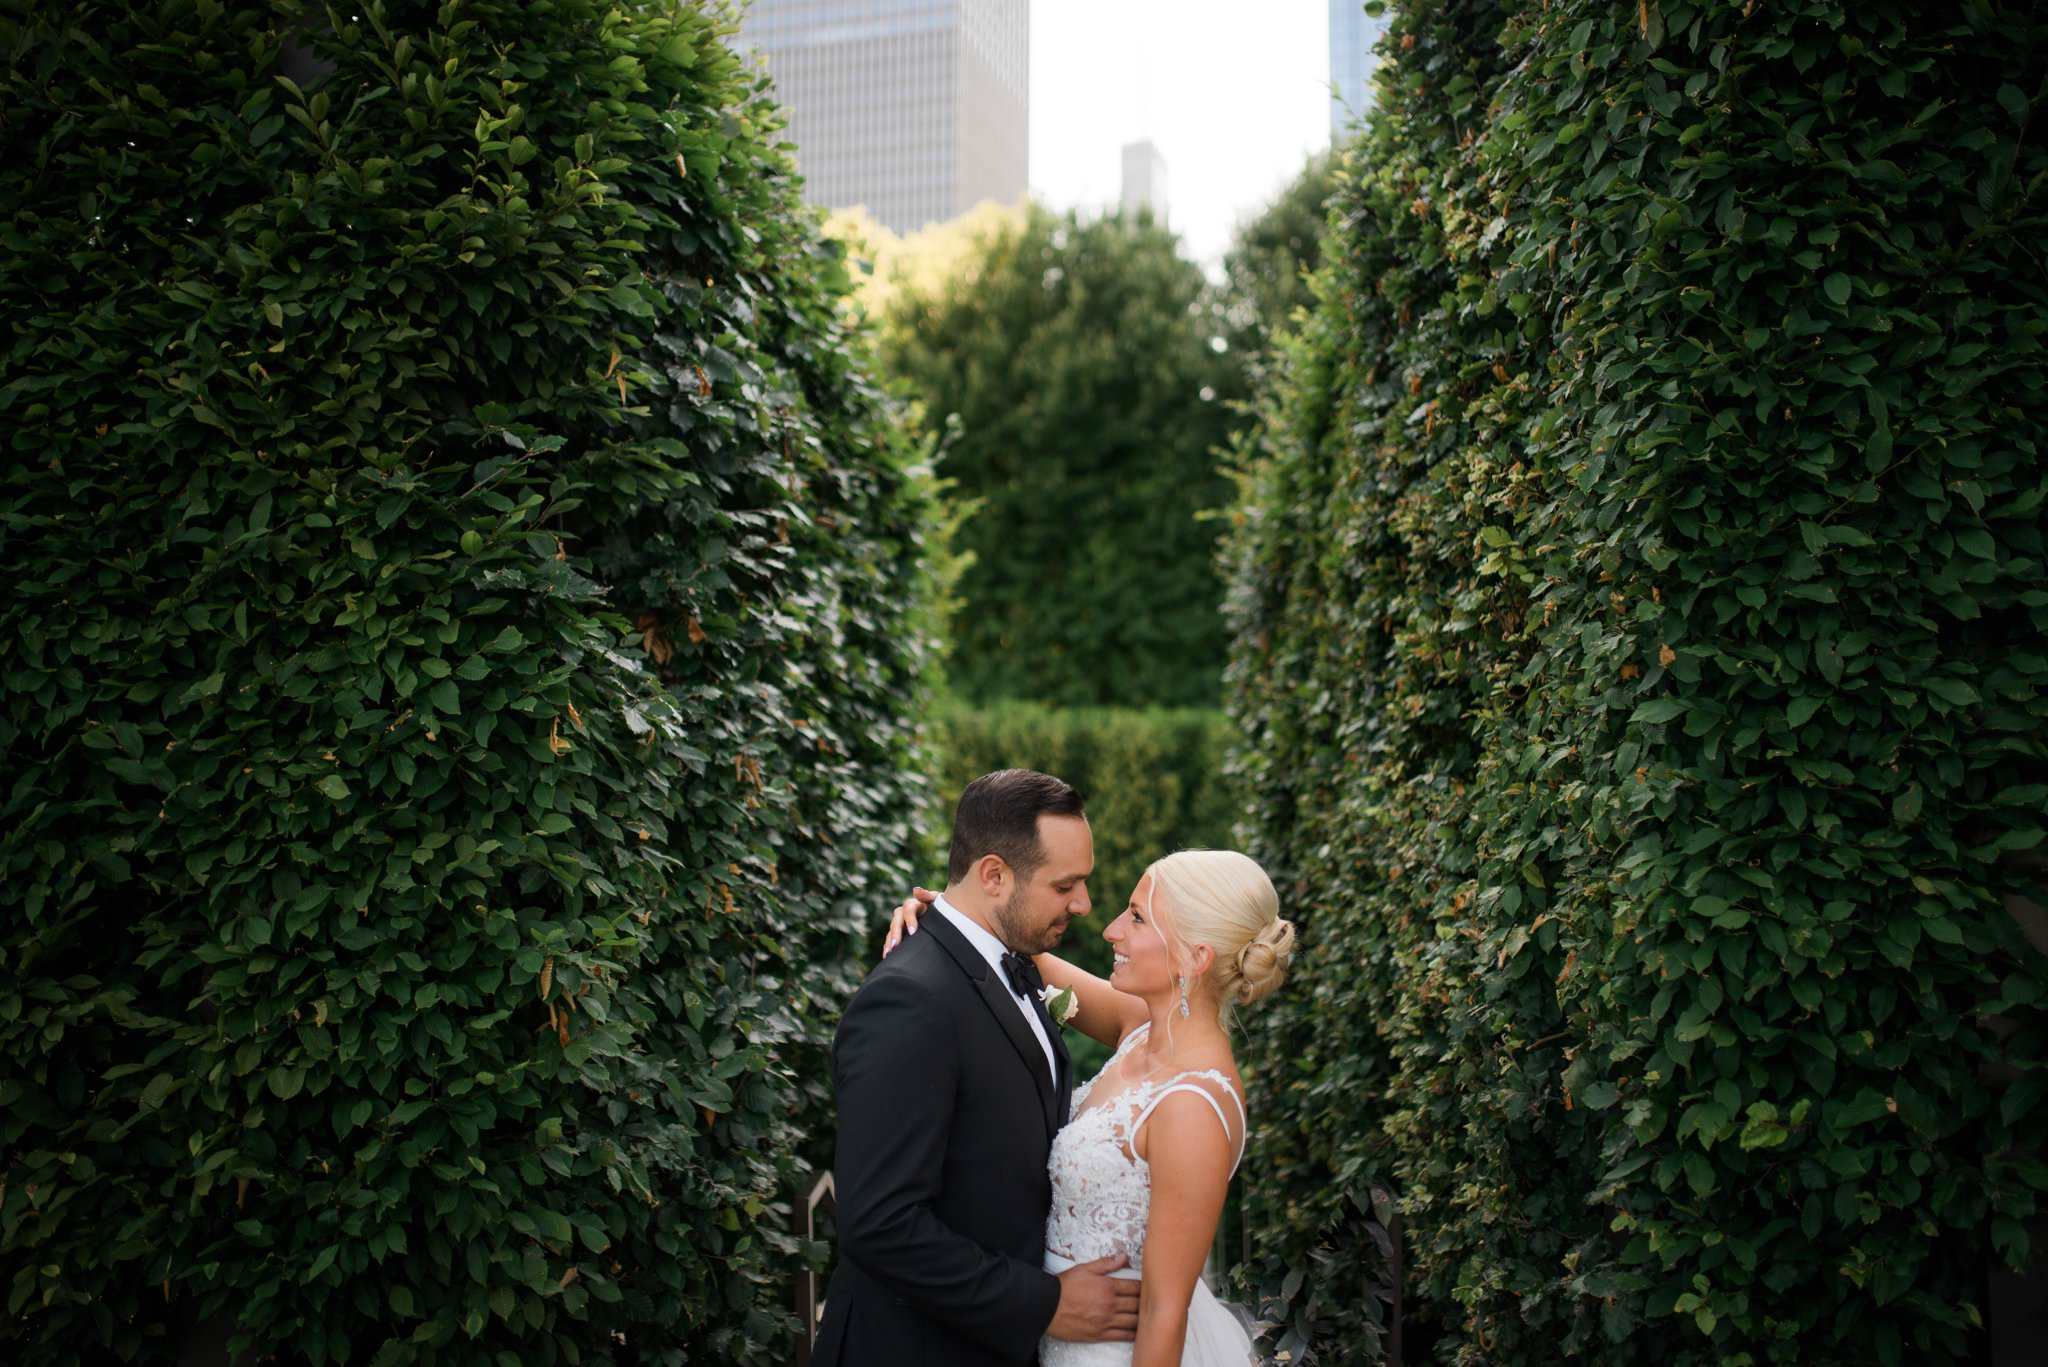 Adler-Planetarium-Chicago-Wedding-Photography-0043.JPG